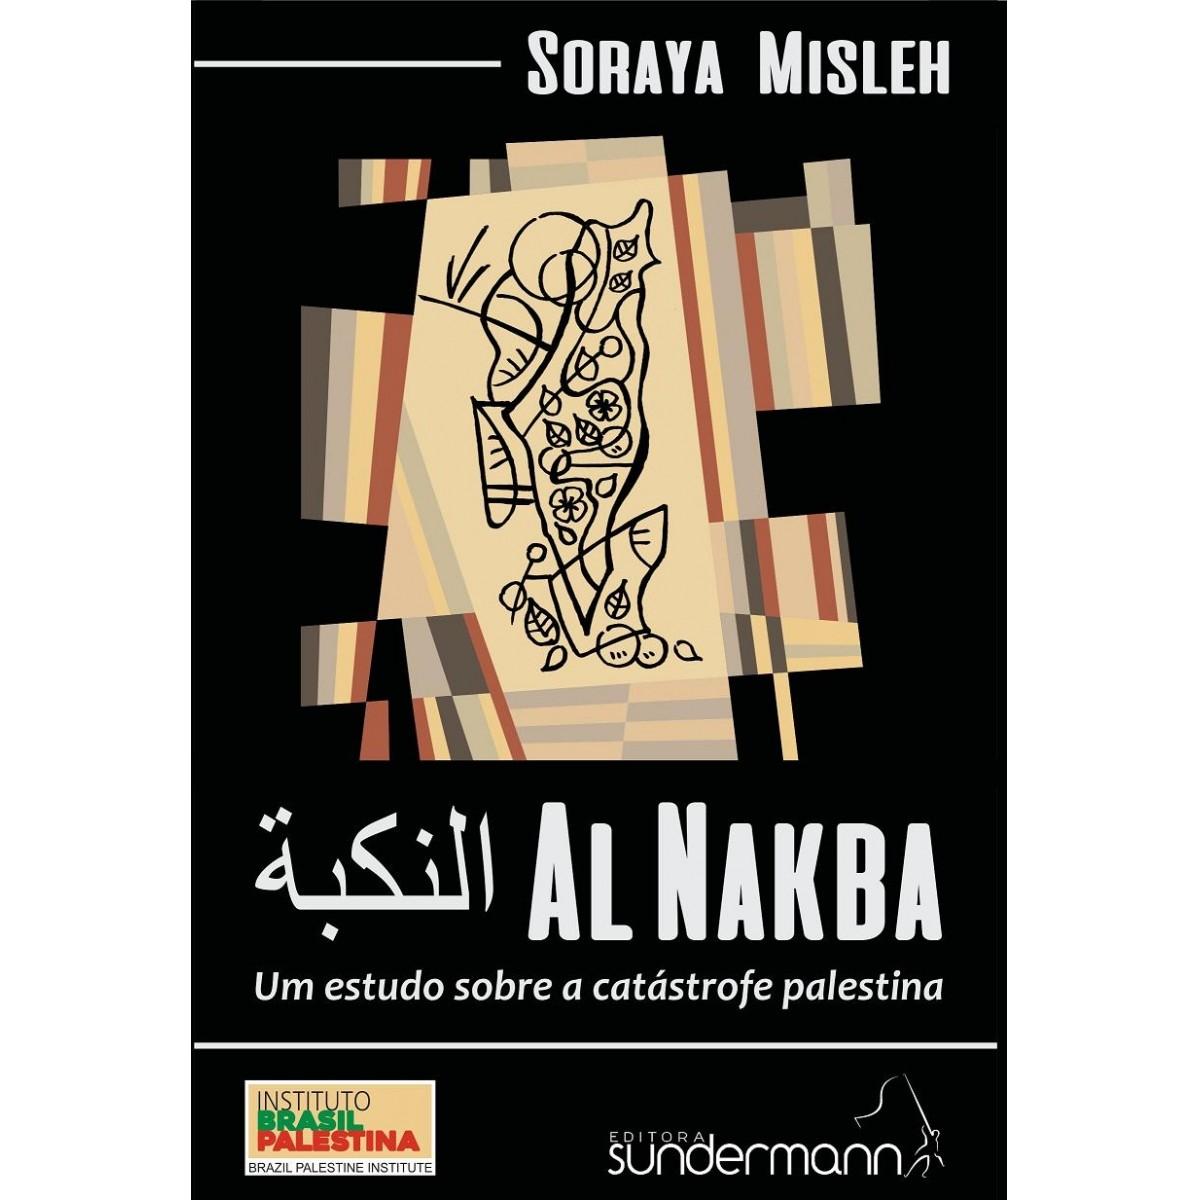 Al Nakba - Um Estudo Sobre a Catástrofe Palestina